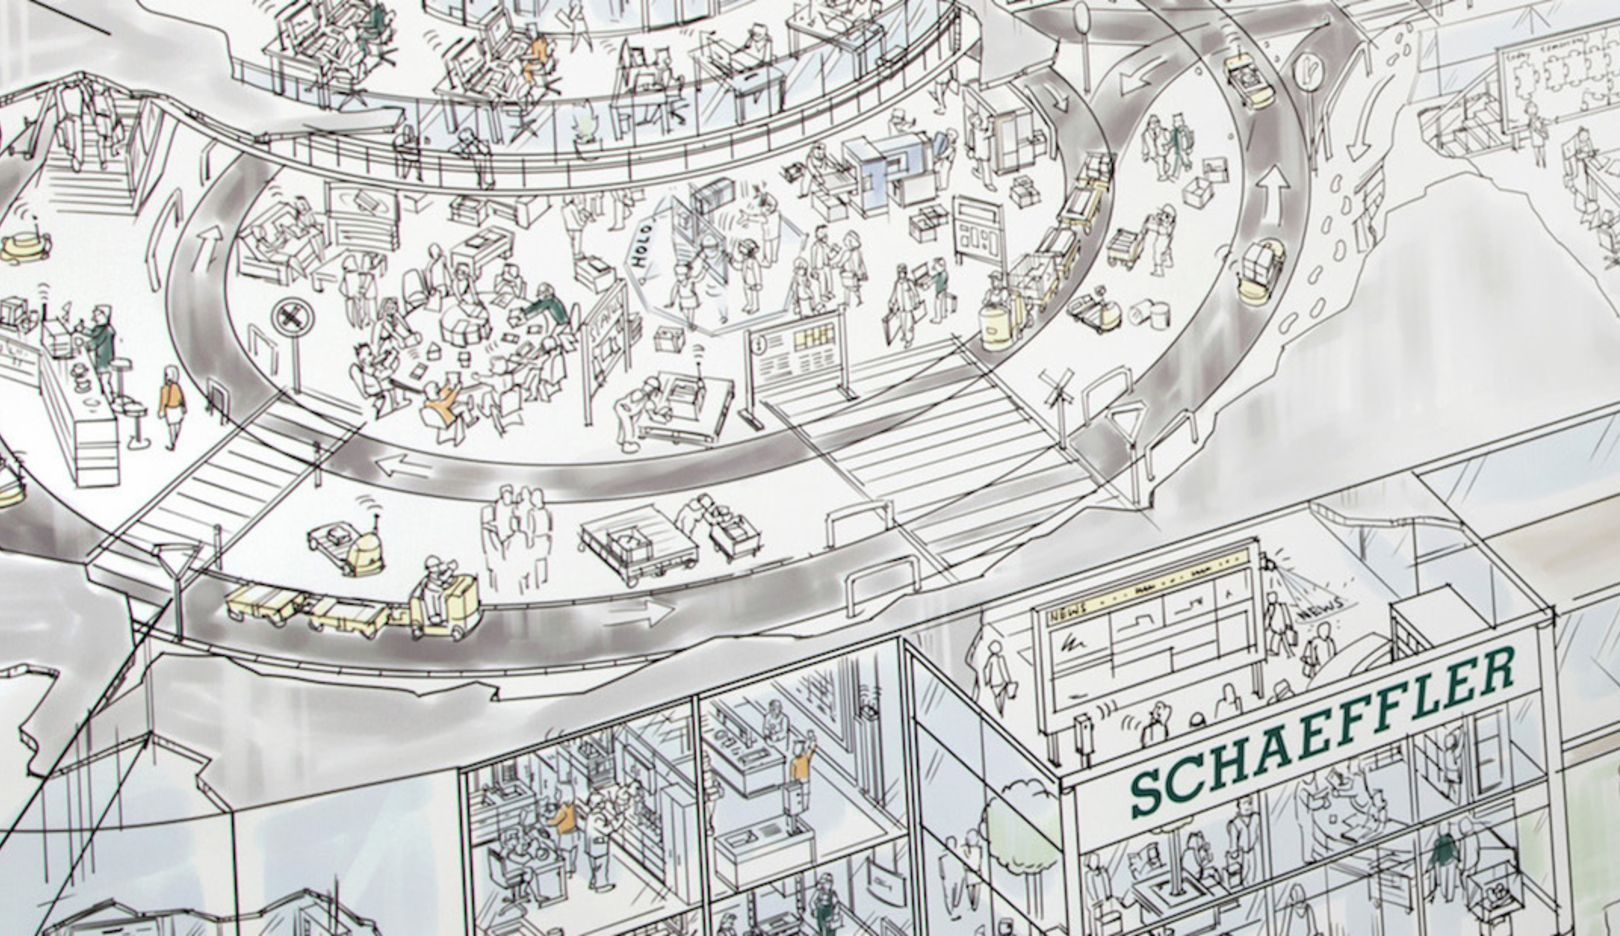 Schaeffler, 2017, Porsche Consulting GmbH